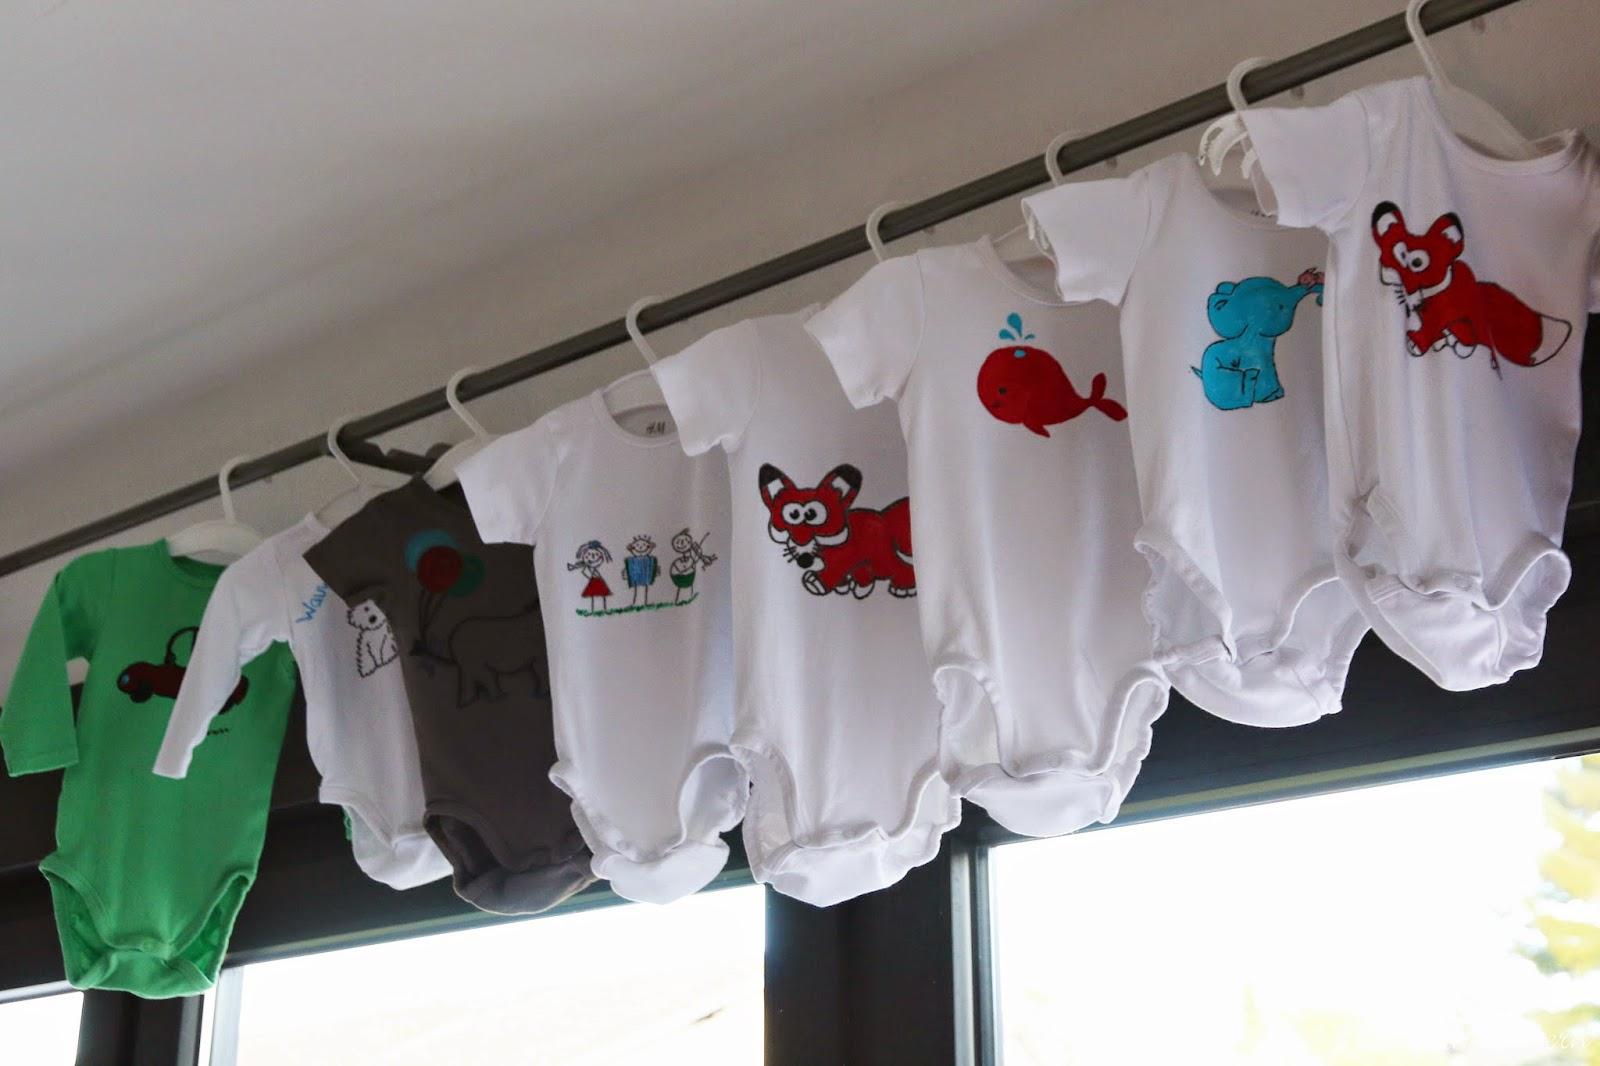 Stadtlandeltern - Babyparty - bemalte Bodys